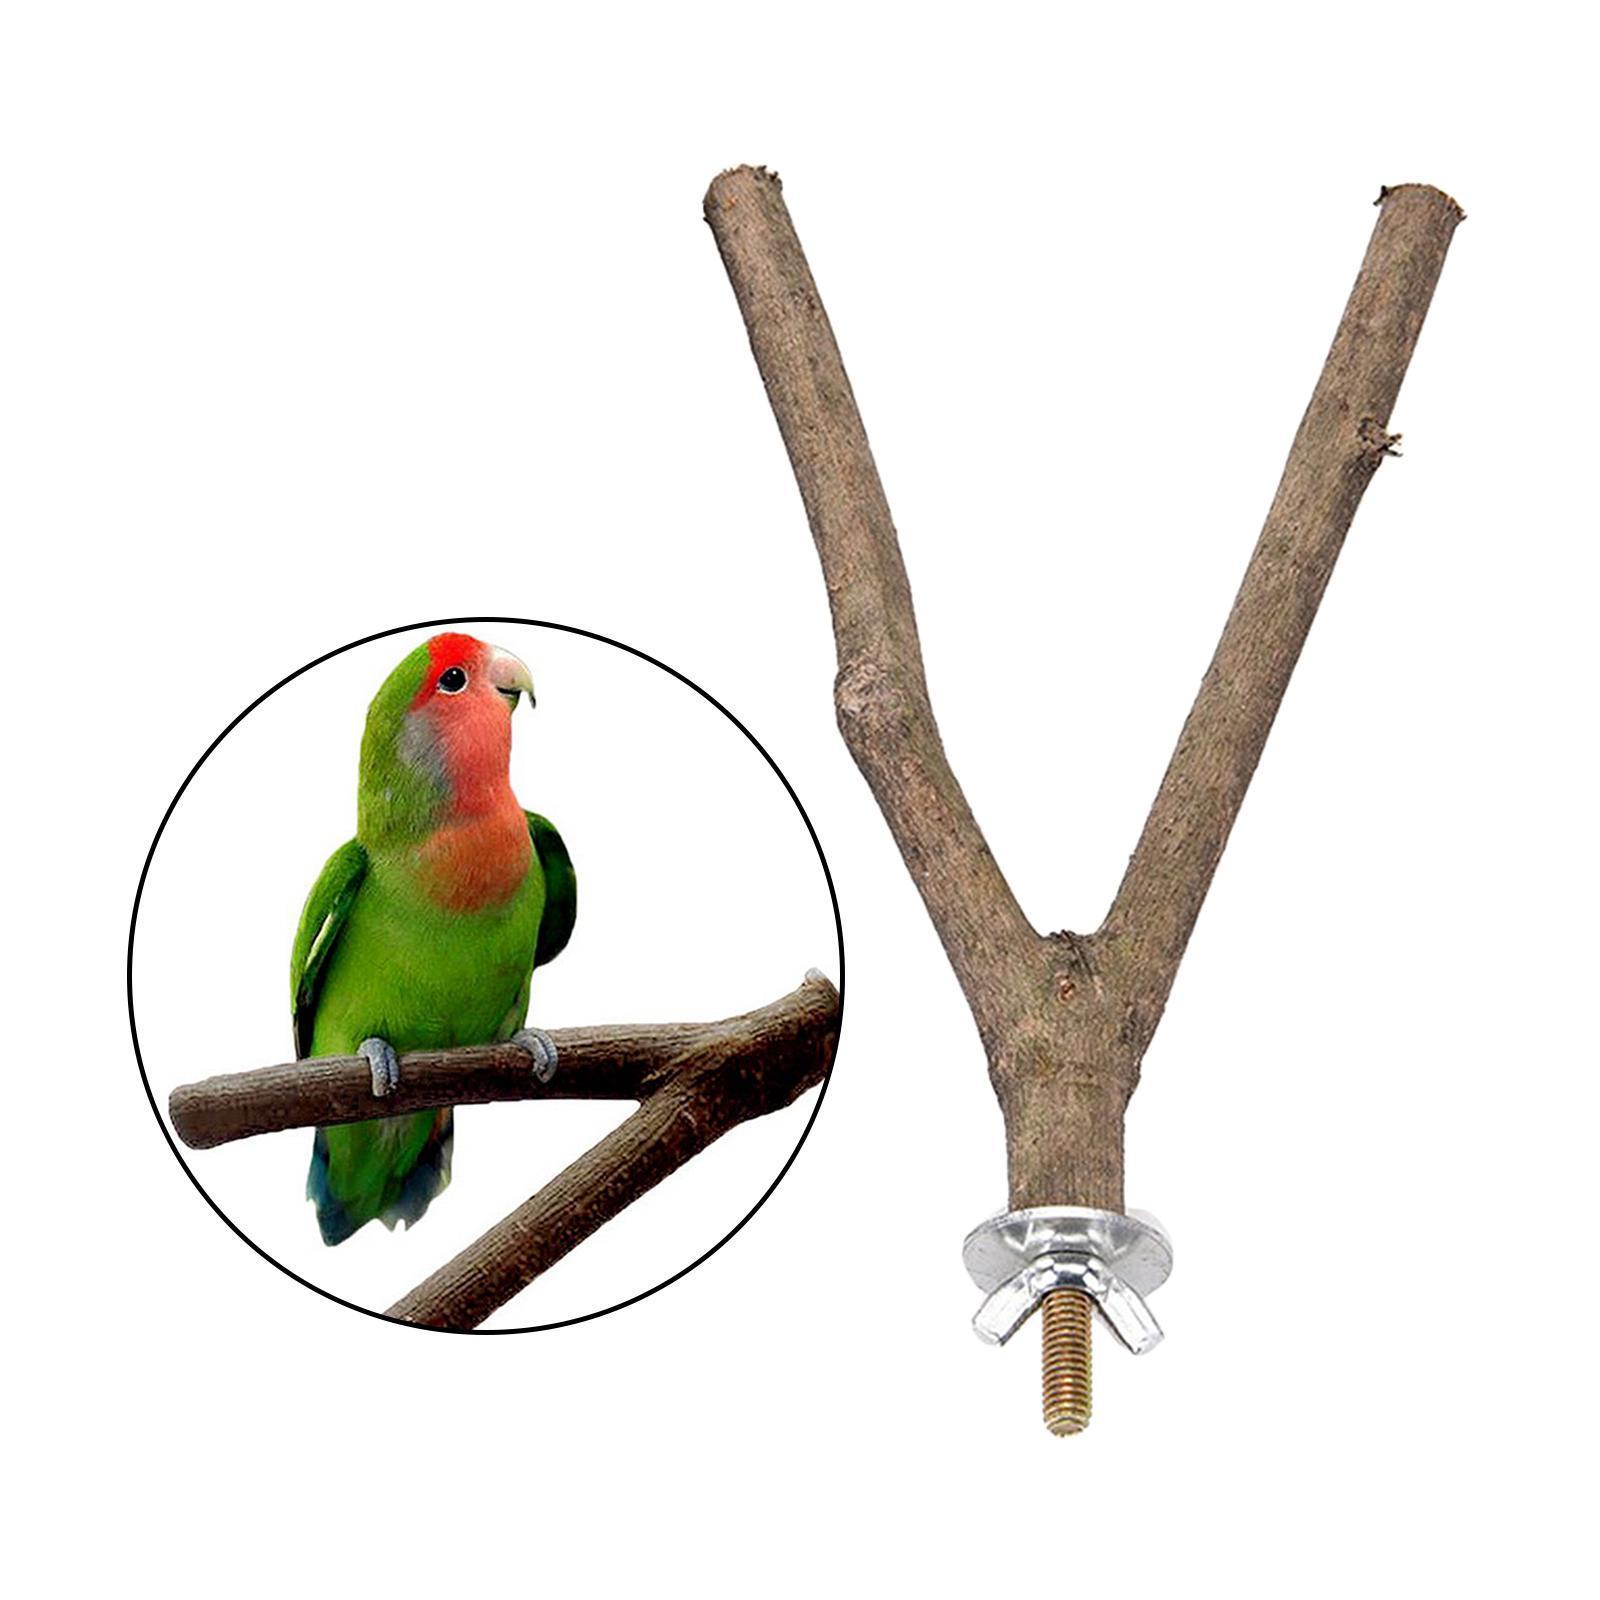 thumbnail 24 - Bird-Perch-Wood-Stand-Bird-Cage-Swing-Branch-for-Parrot-Parakeet-Cockatiel